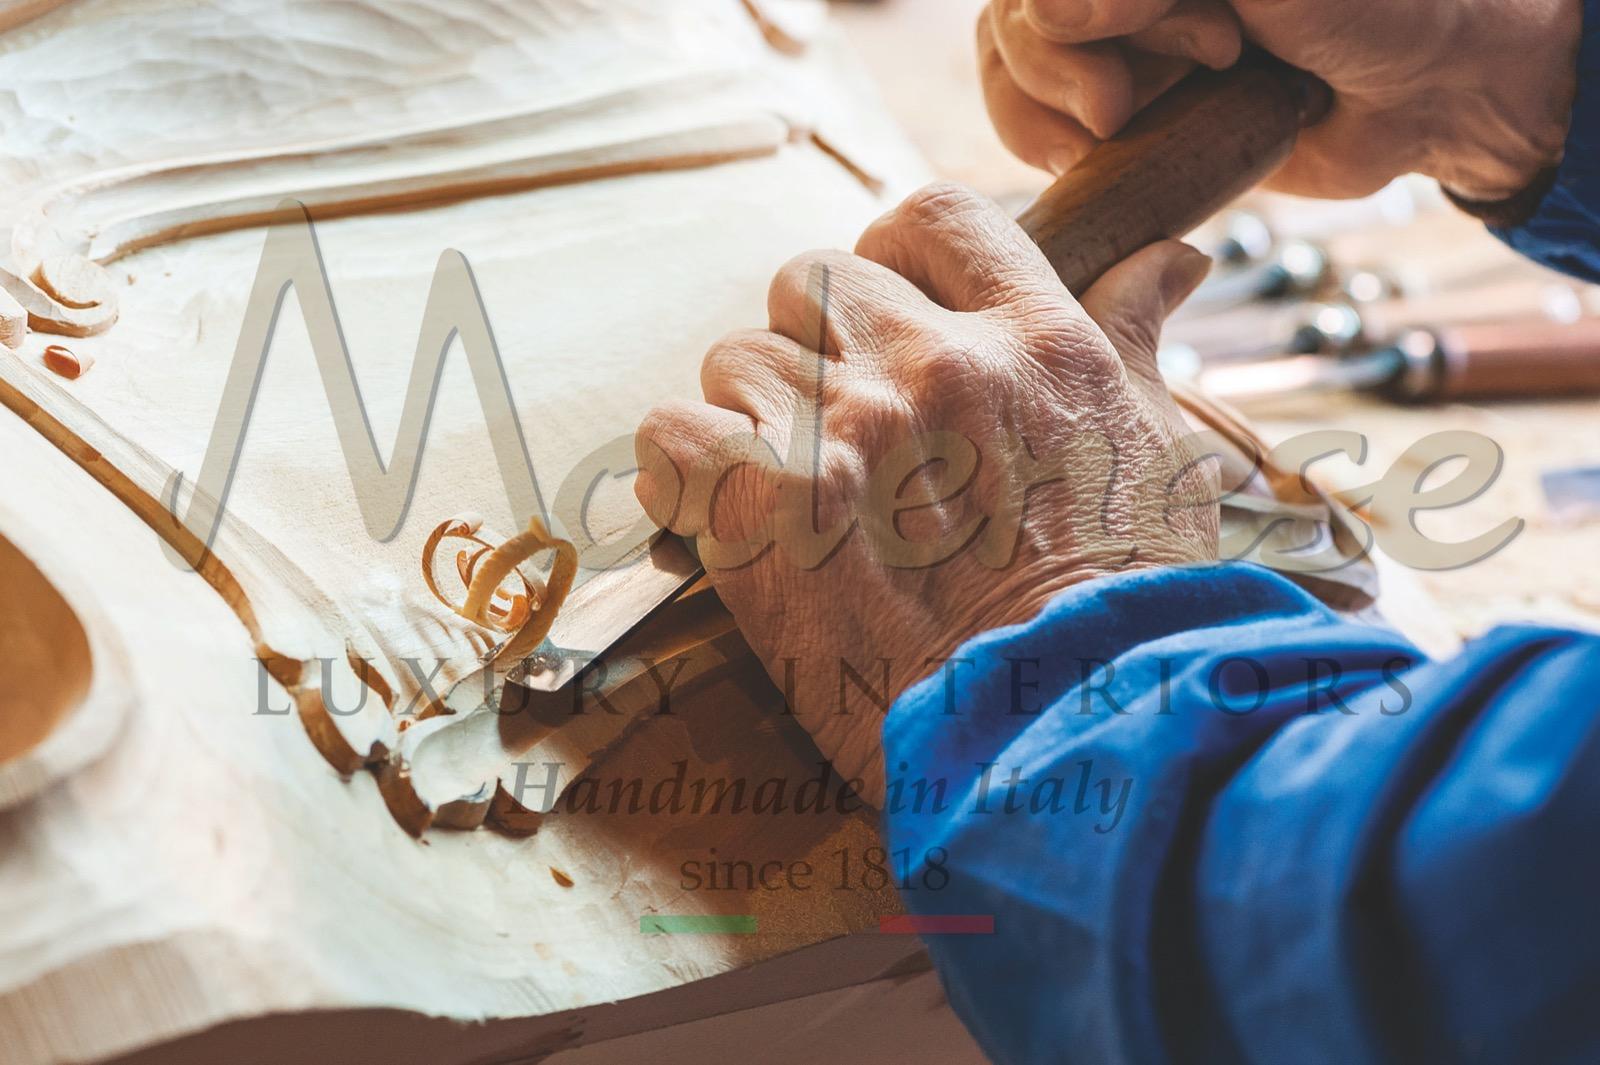 handmade furniture Italian production artisans artisanal skills craftsmanship made in Italy interior design projects home decoration